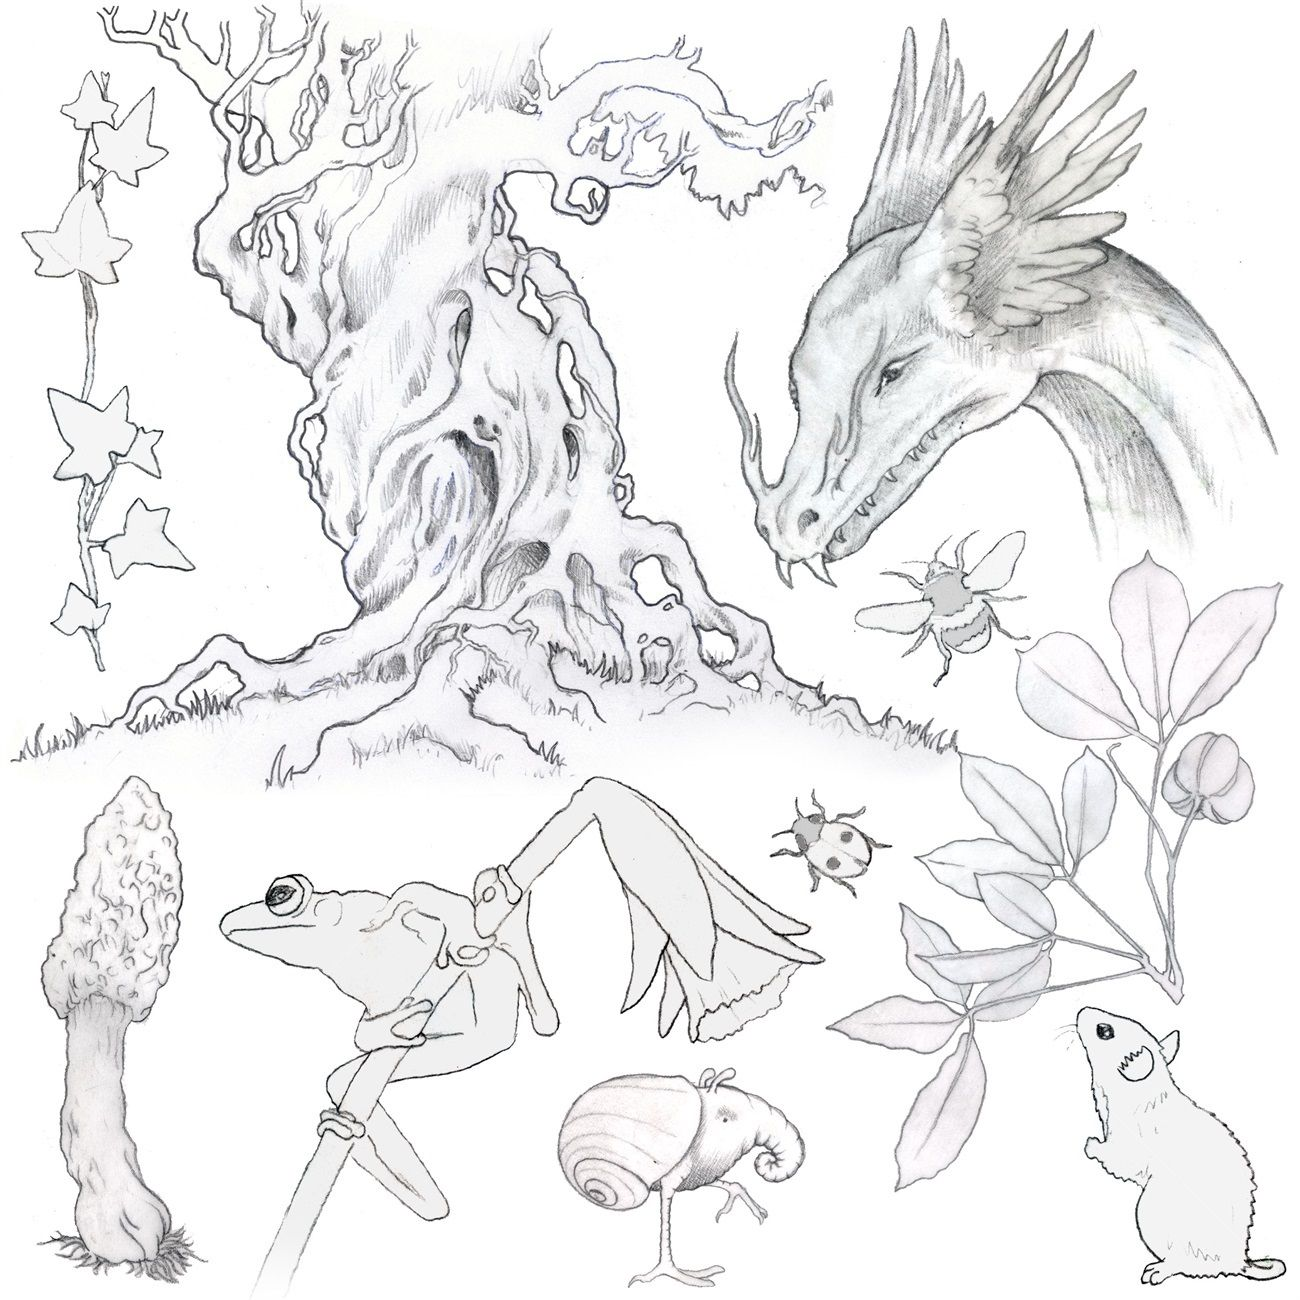 Aquatic Wetland And Invasive Plants Line Drawings